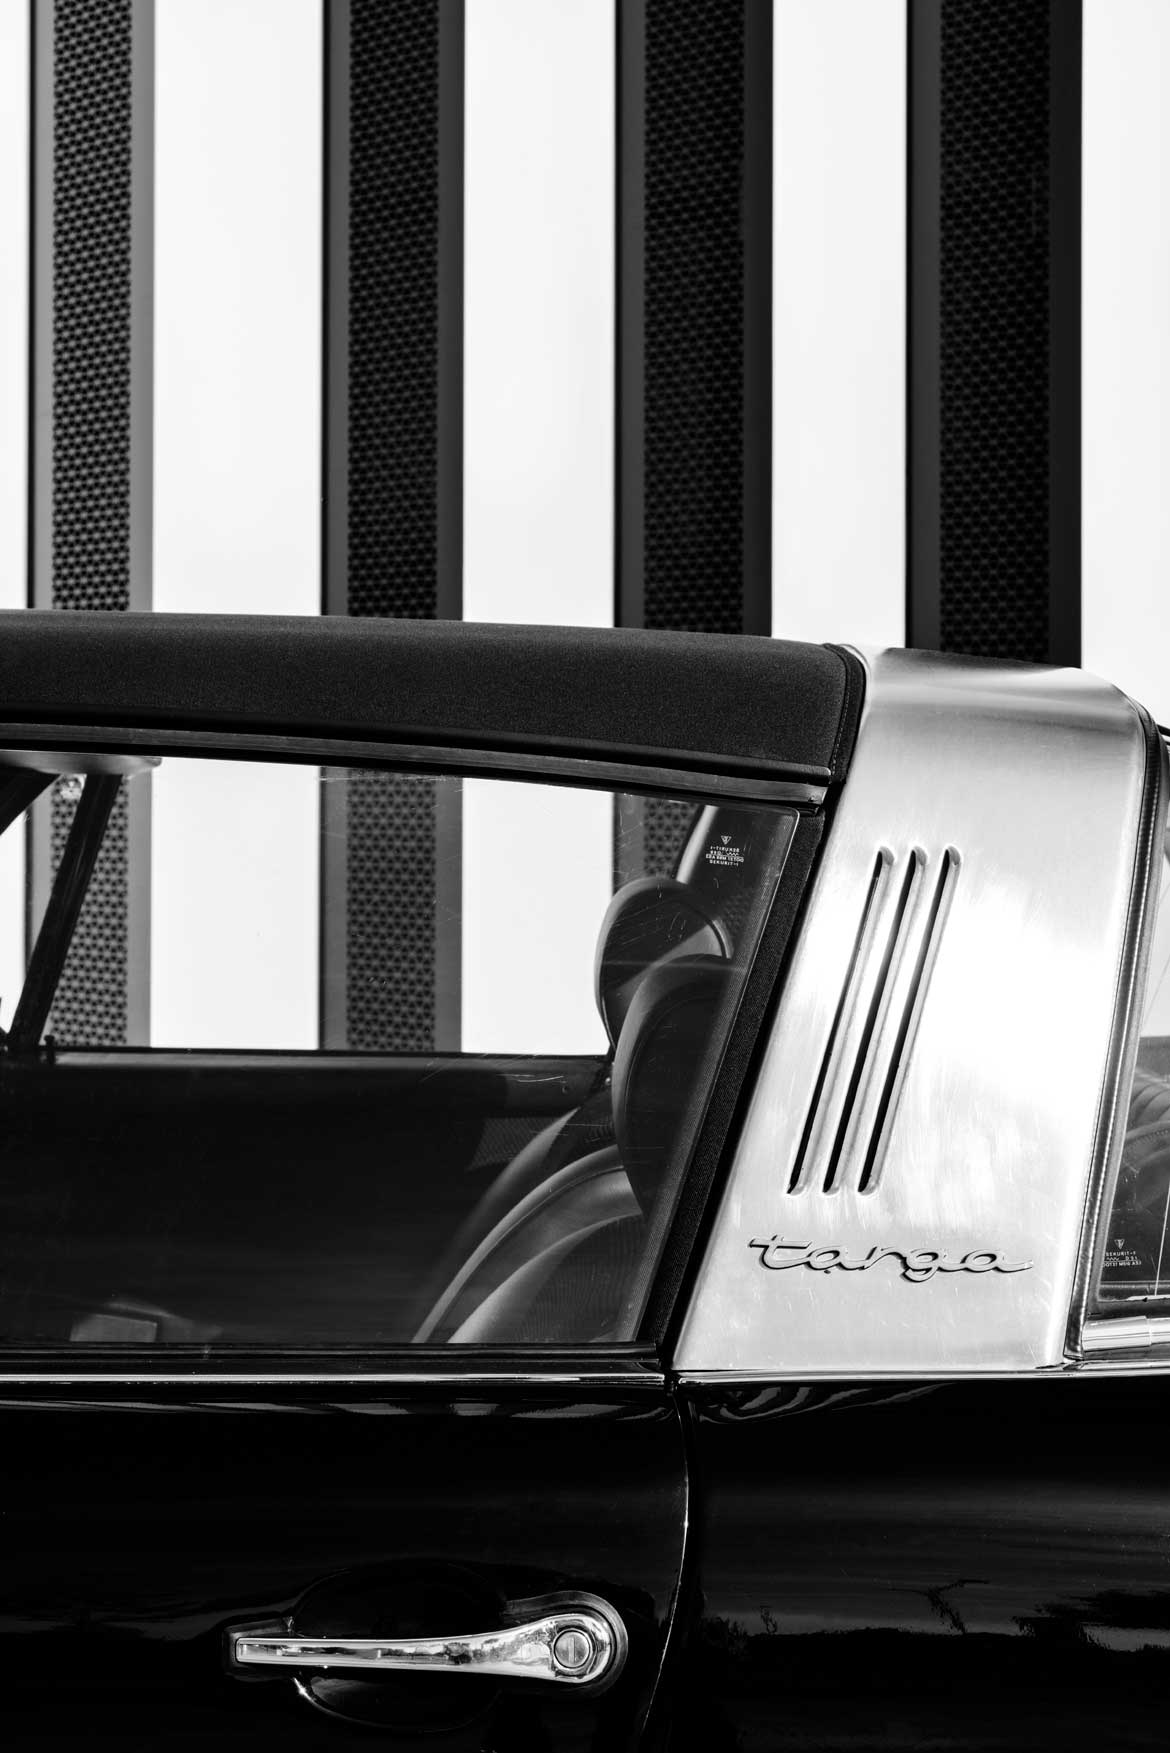 Lookfilter-Porsche-911-Targa-Image8